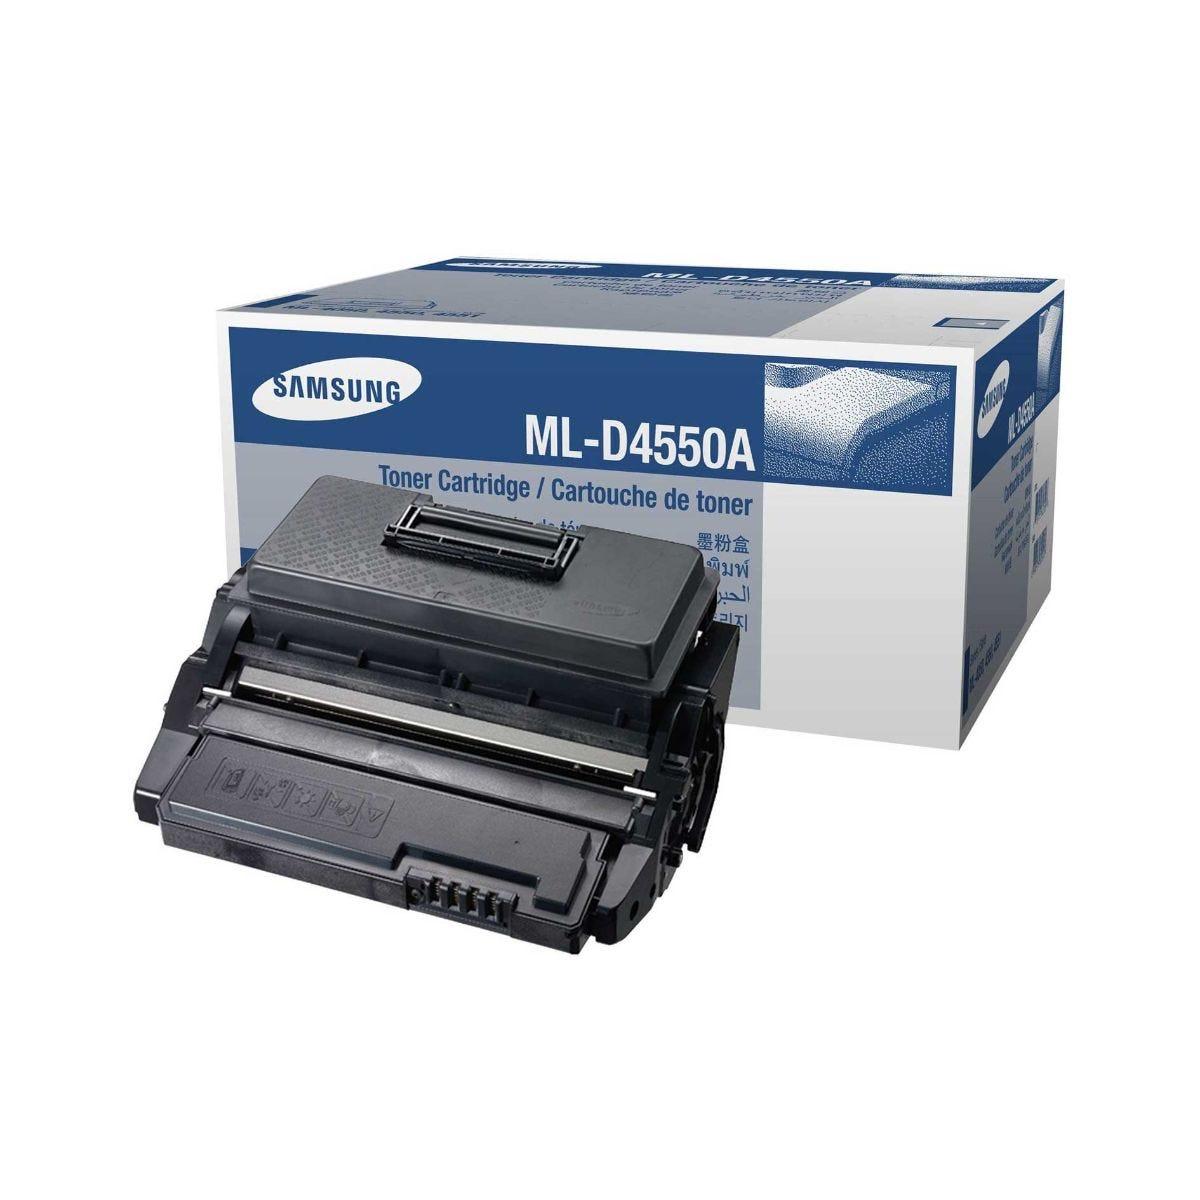 Samsung ML-D4550A Printer Toner Drum, Black